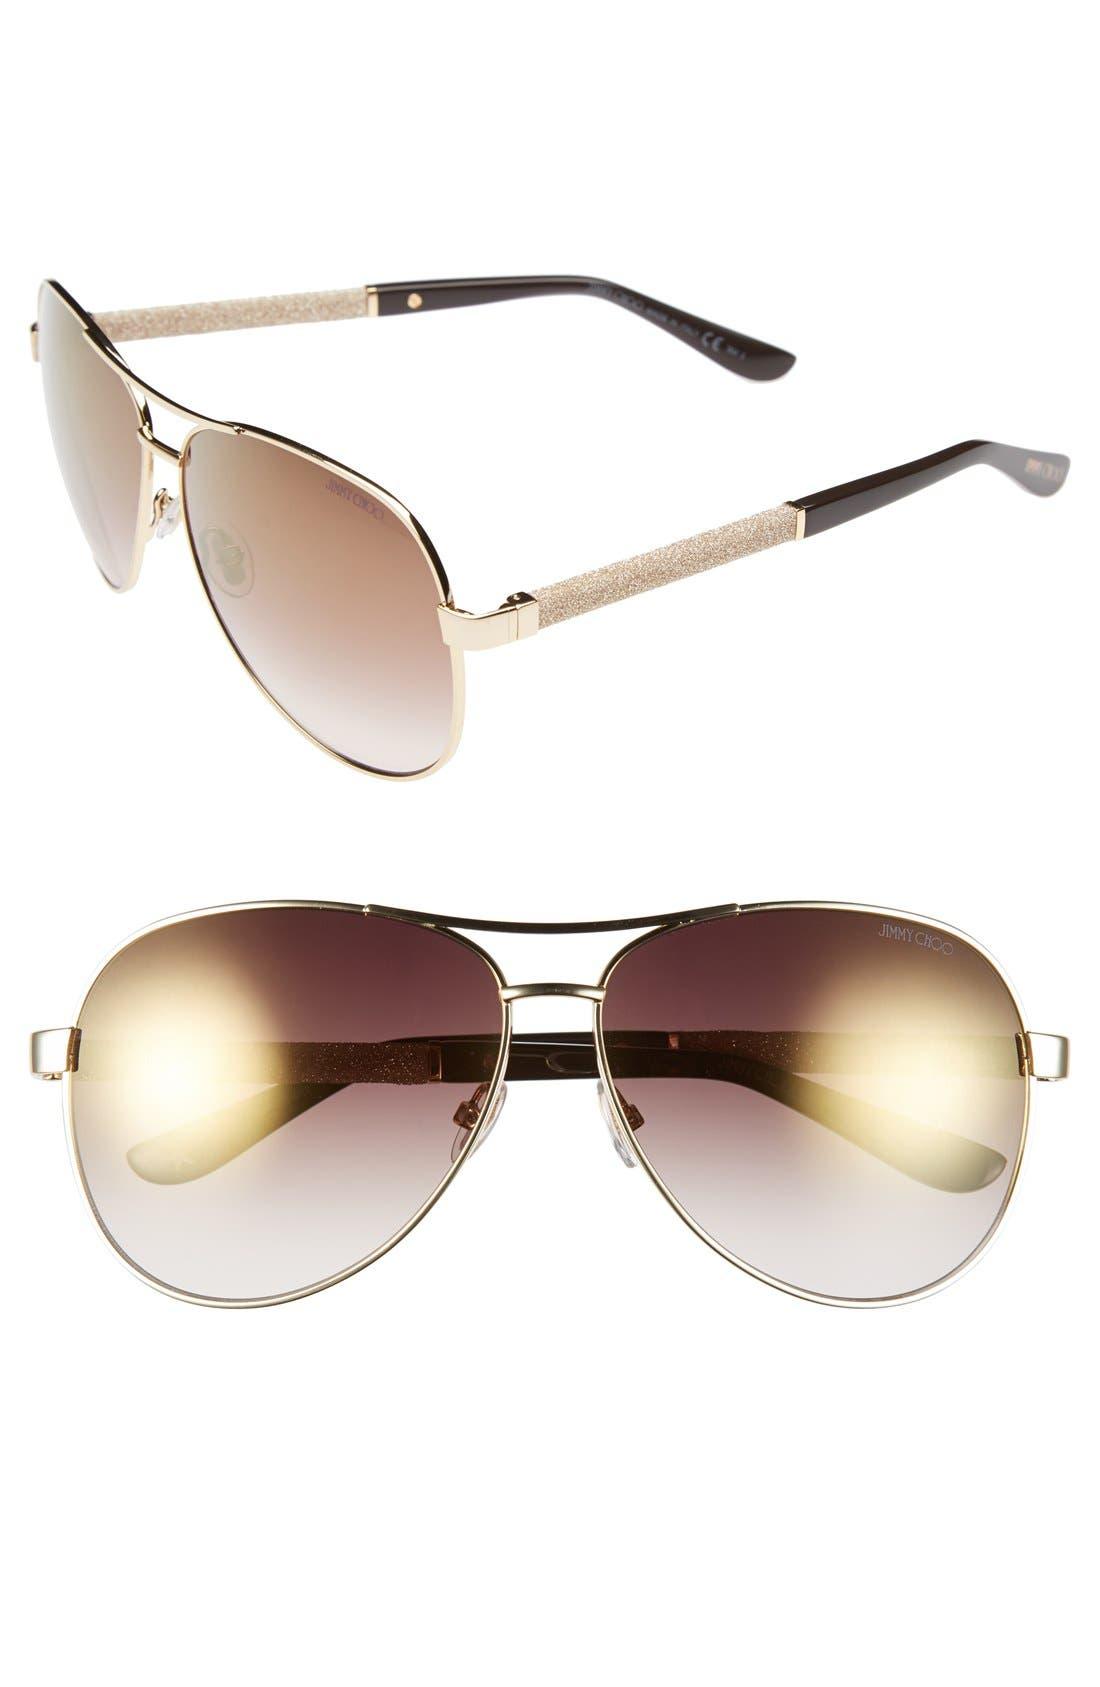 61mm Aviator Sunglasses,                             Main thumbnail 3, color,